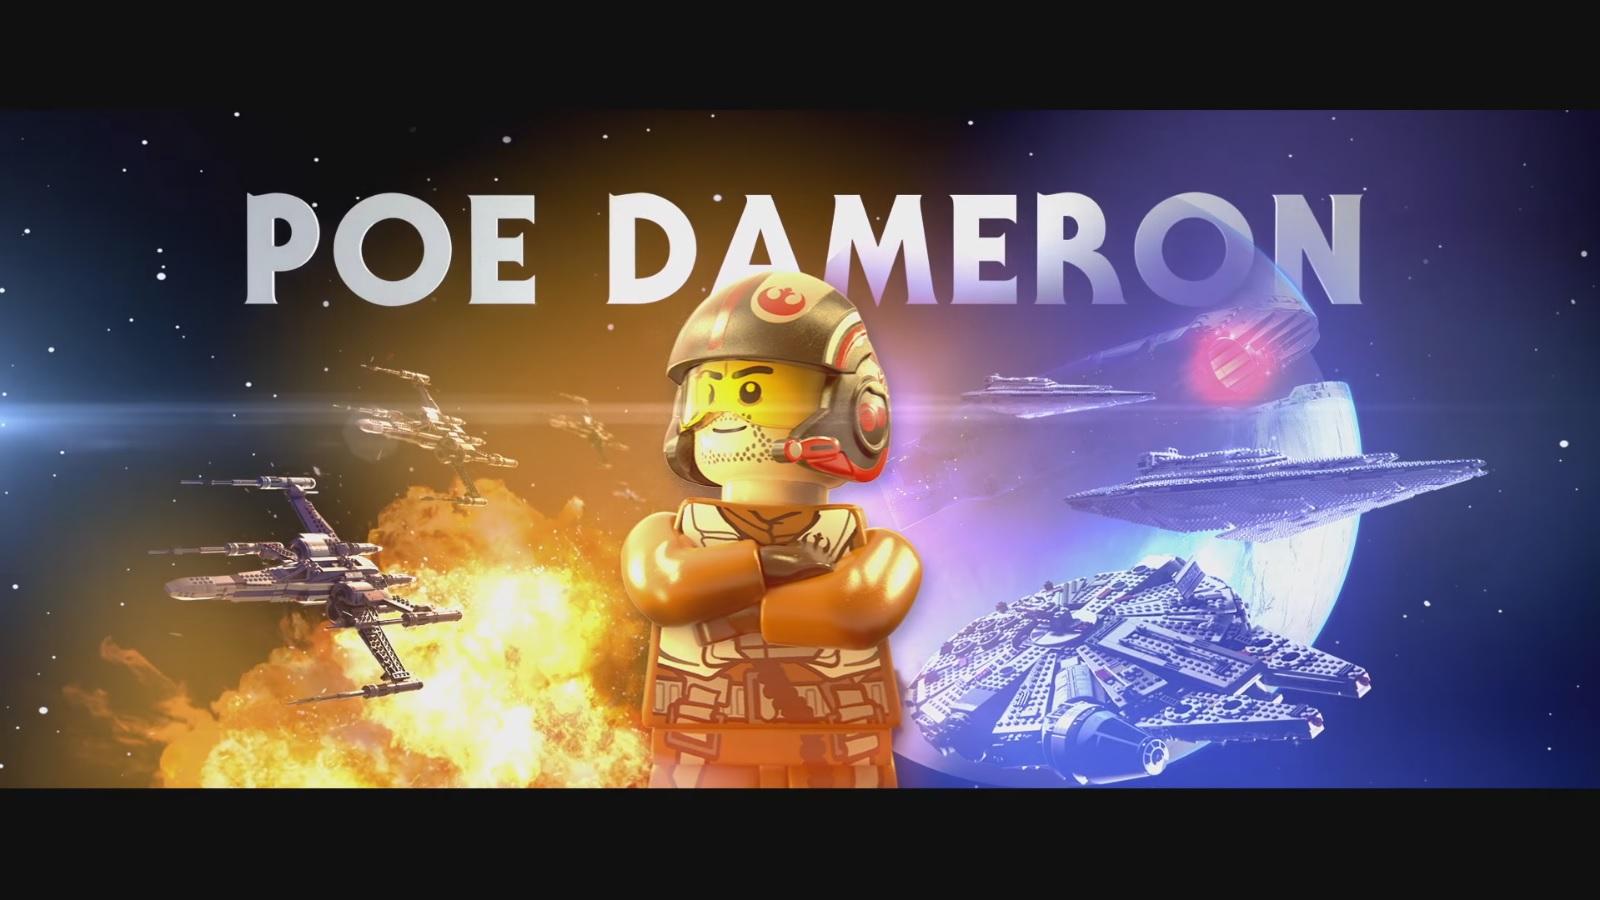 Lego Star Wars The Force Awakens Poe Dameron Character Vignette